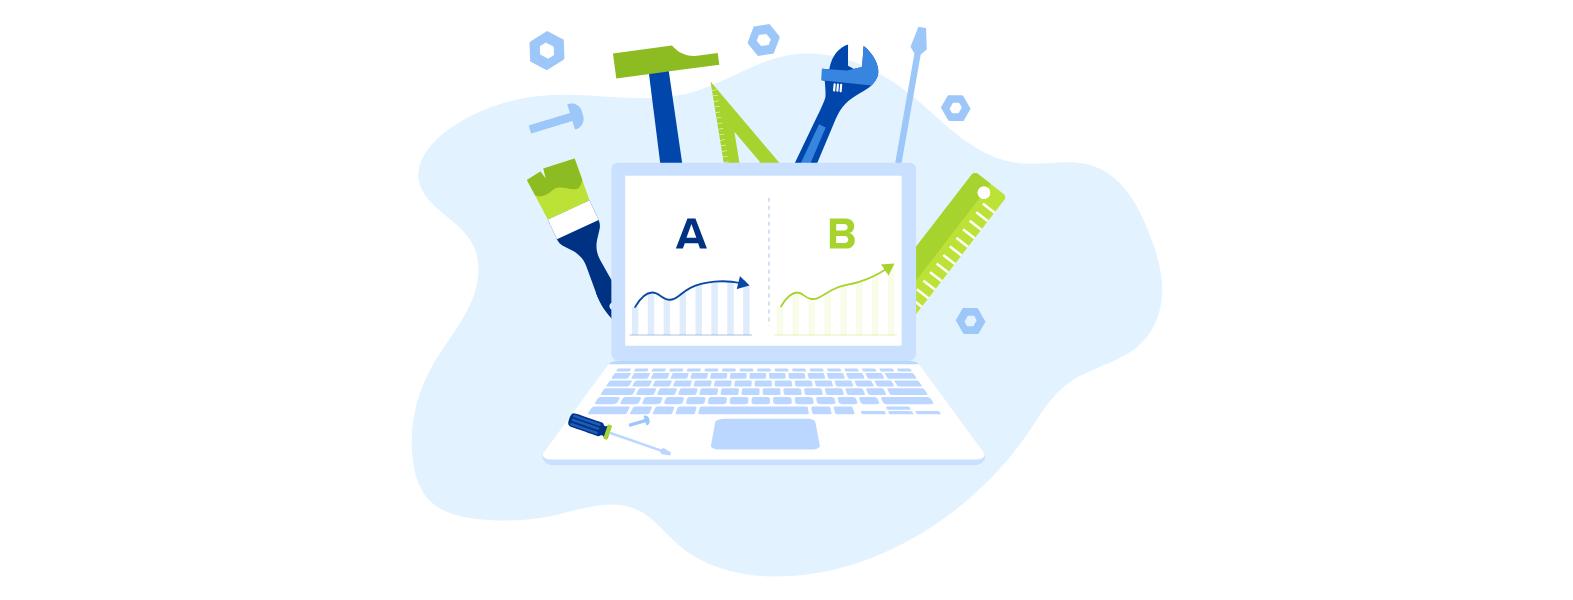 split-testing, a/b/n and multivariate testing tools